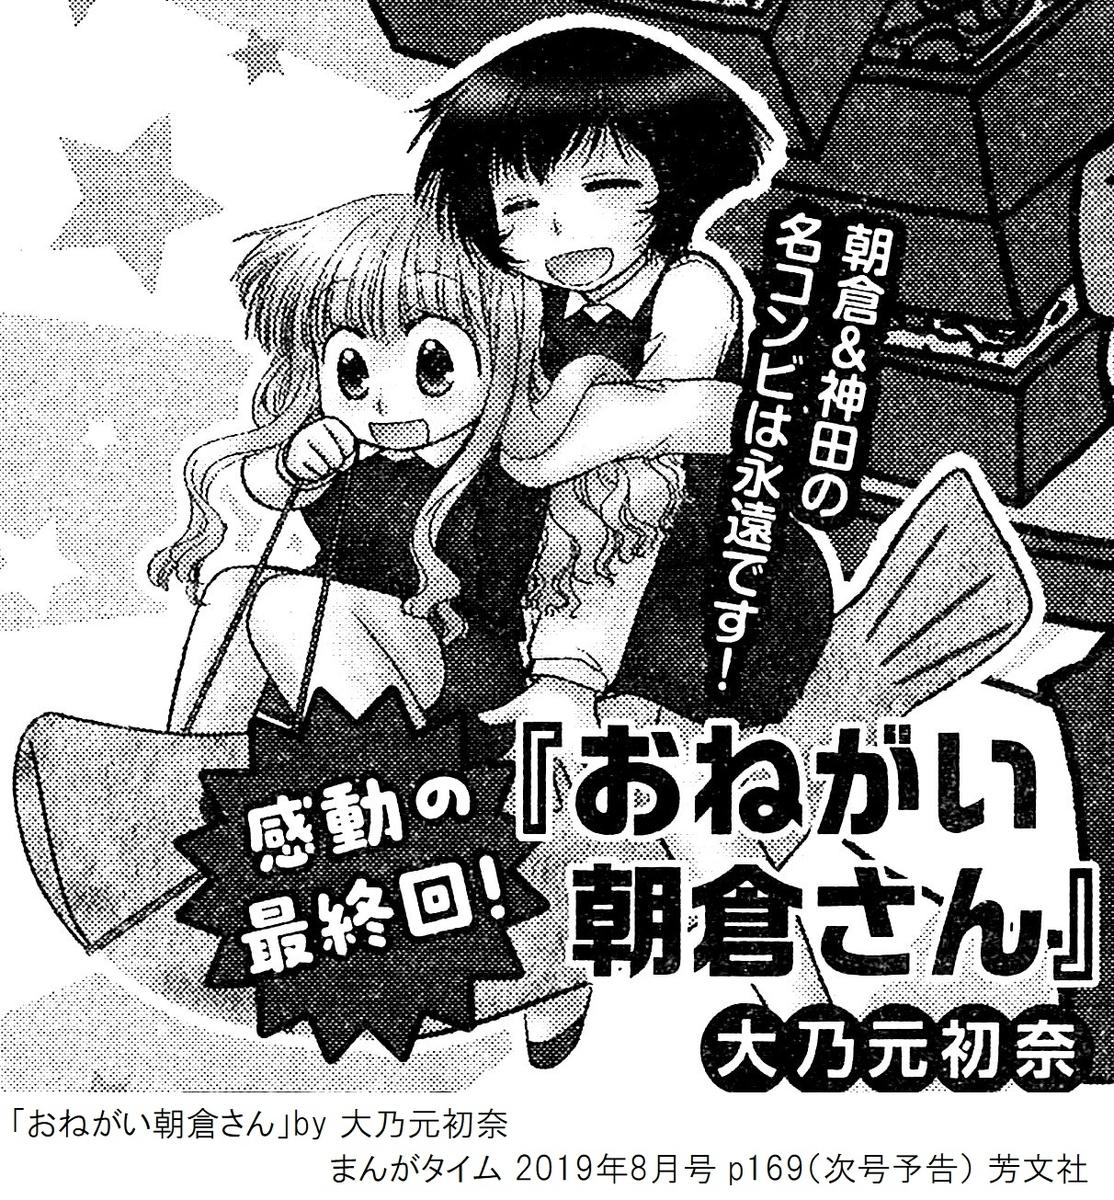 f:id:tanaka-minoru-fake:20190706140046j:plain